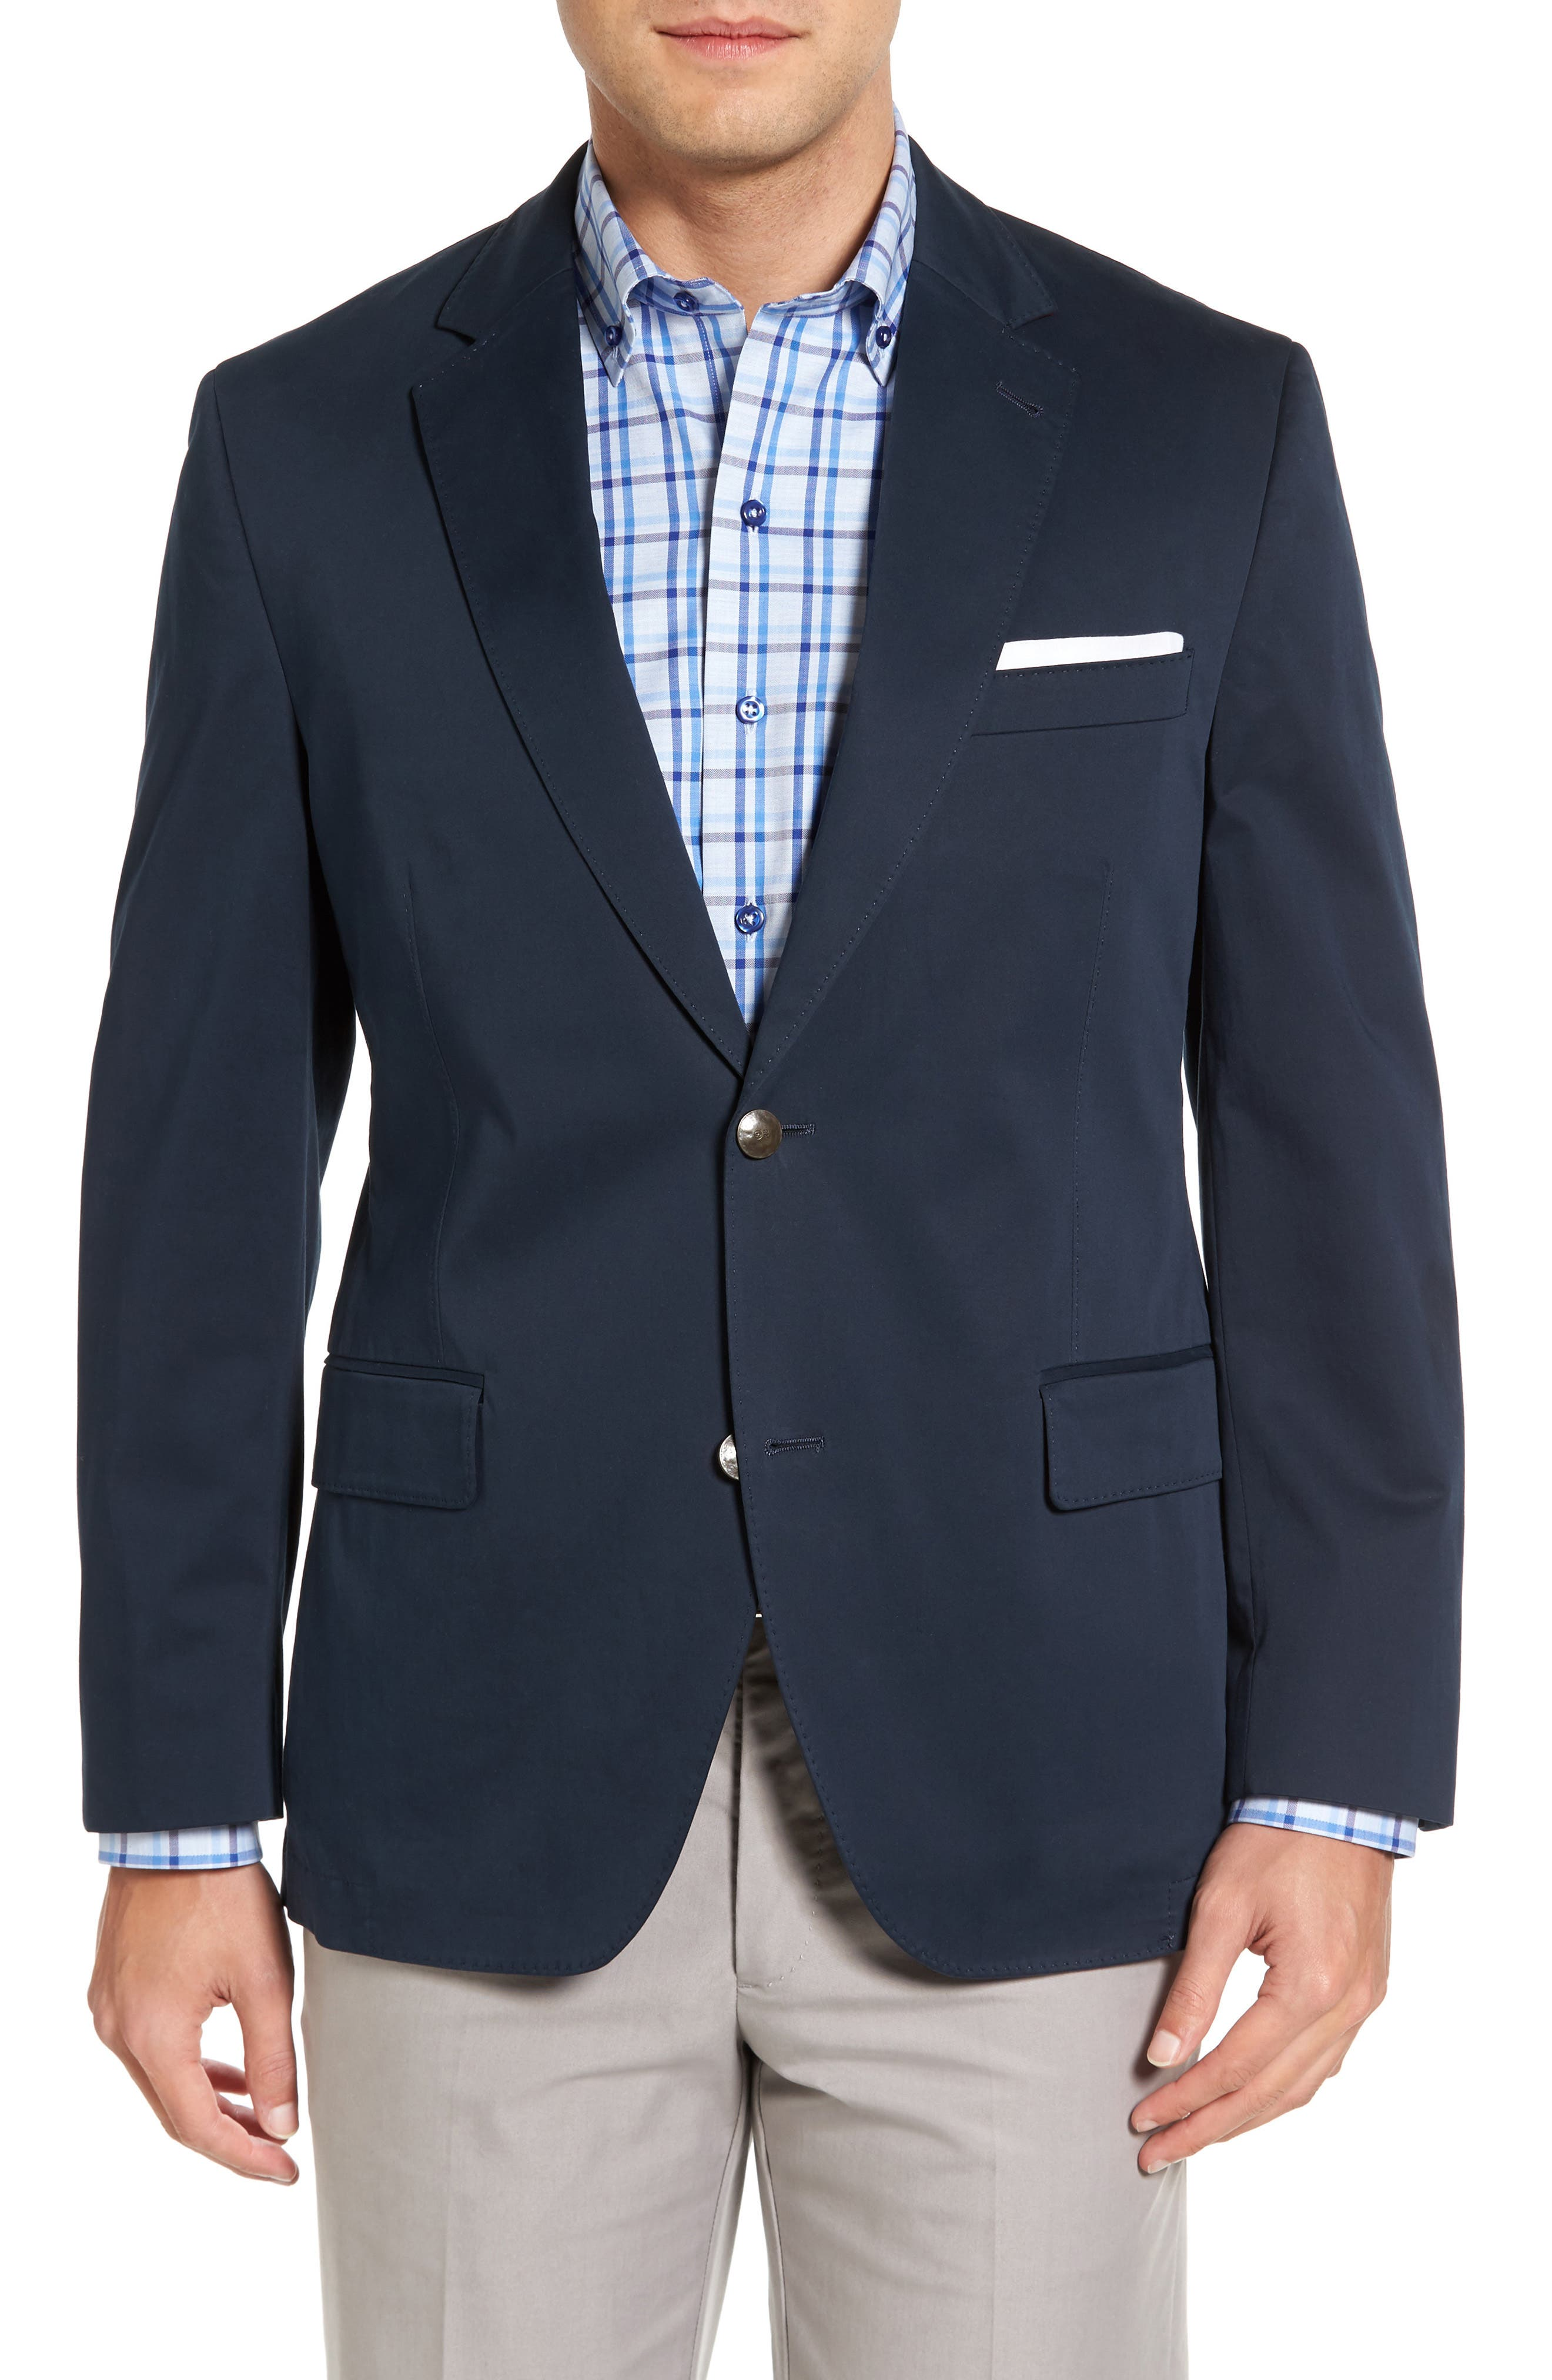 Mathis Classic Fit Stretch Cotton Blazer,                             Main thumbnail 1, color,                             Navy